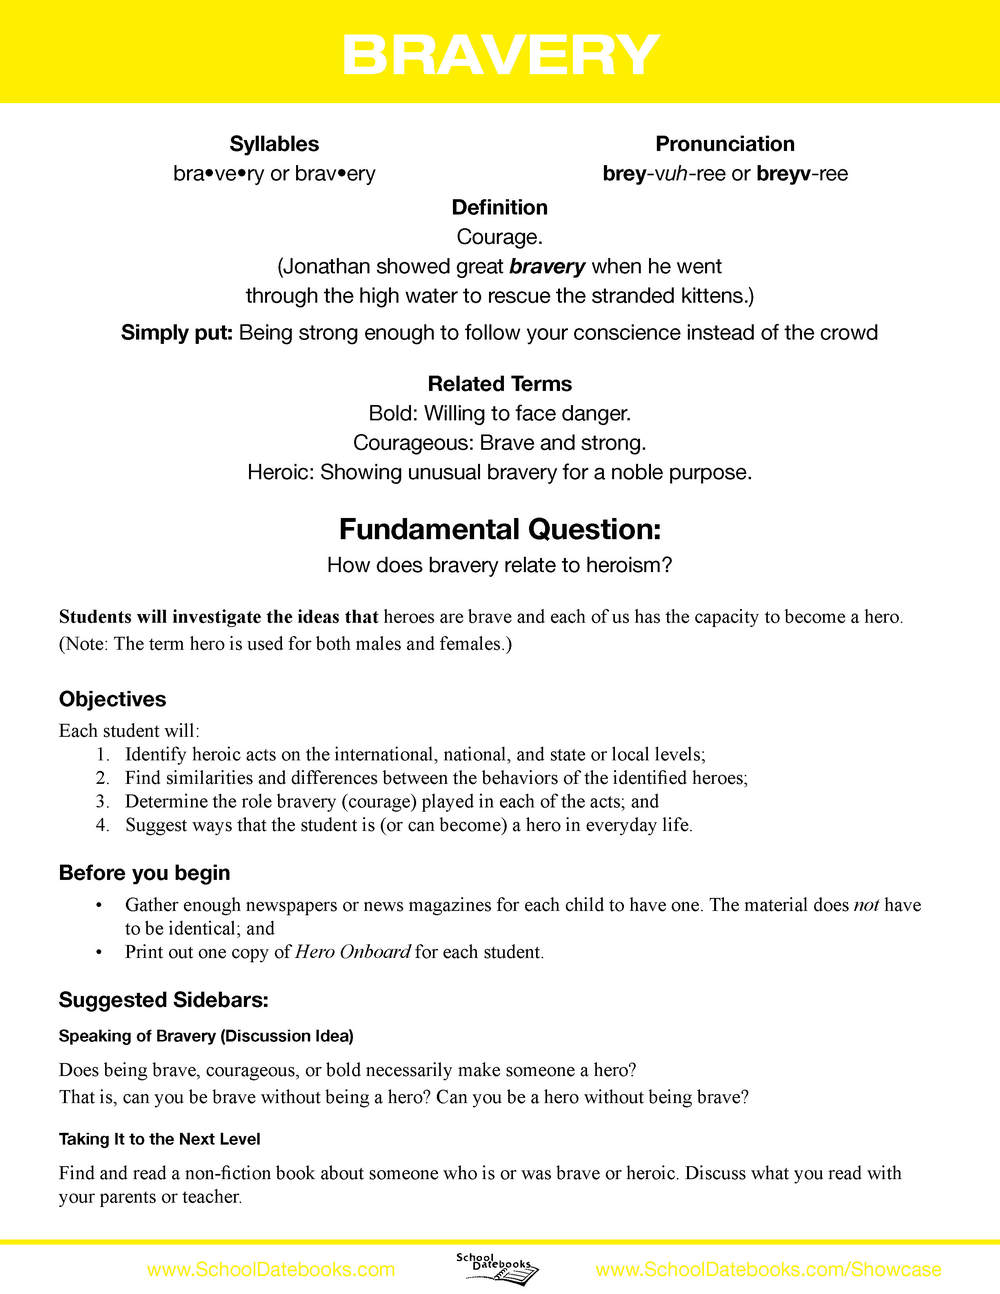 LessonPlan-Bravery_Page_1.jpg